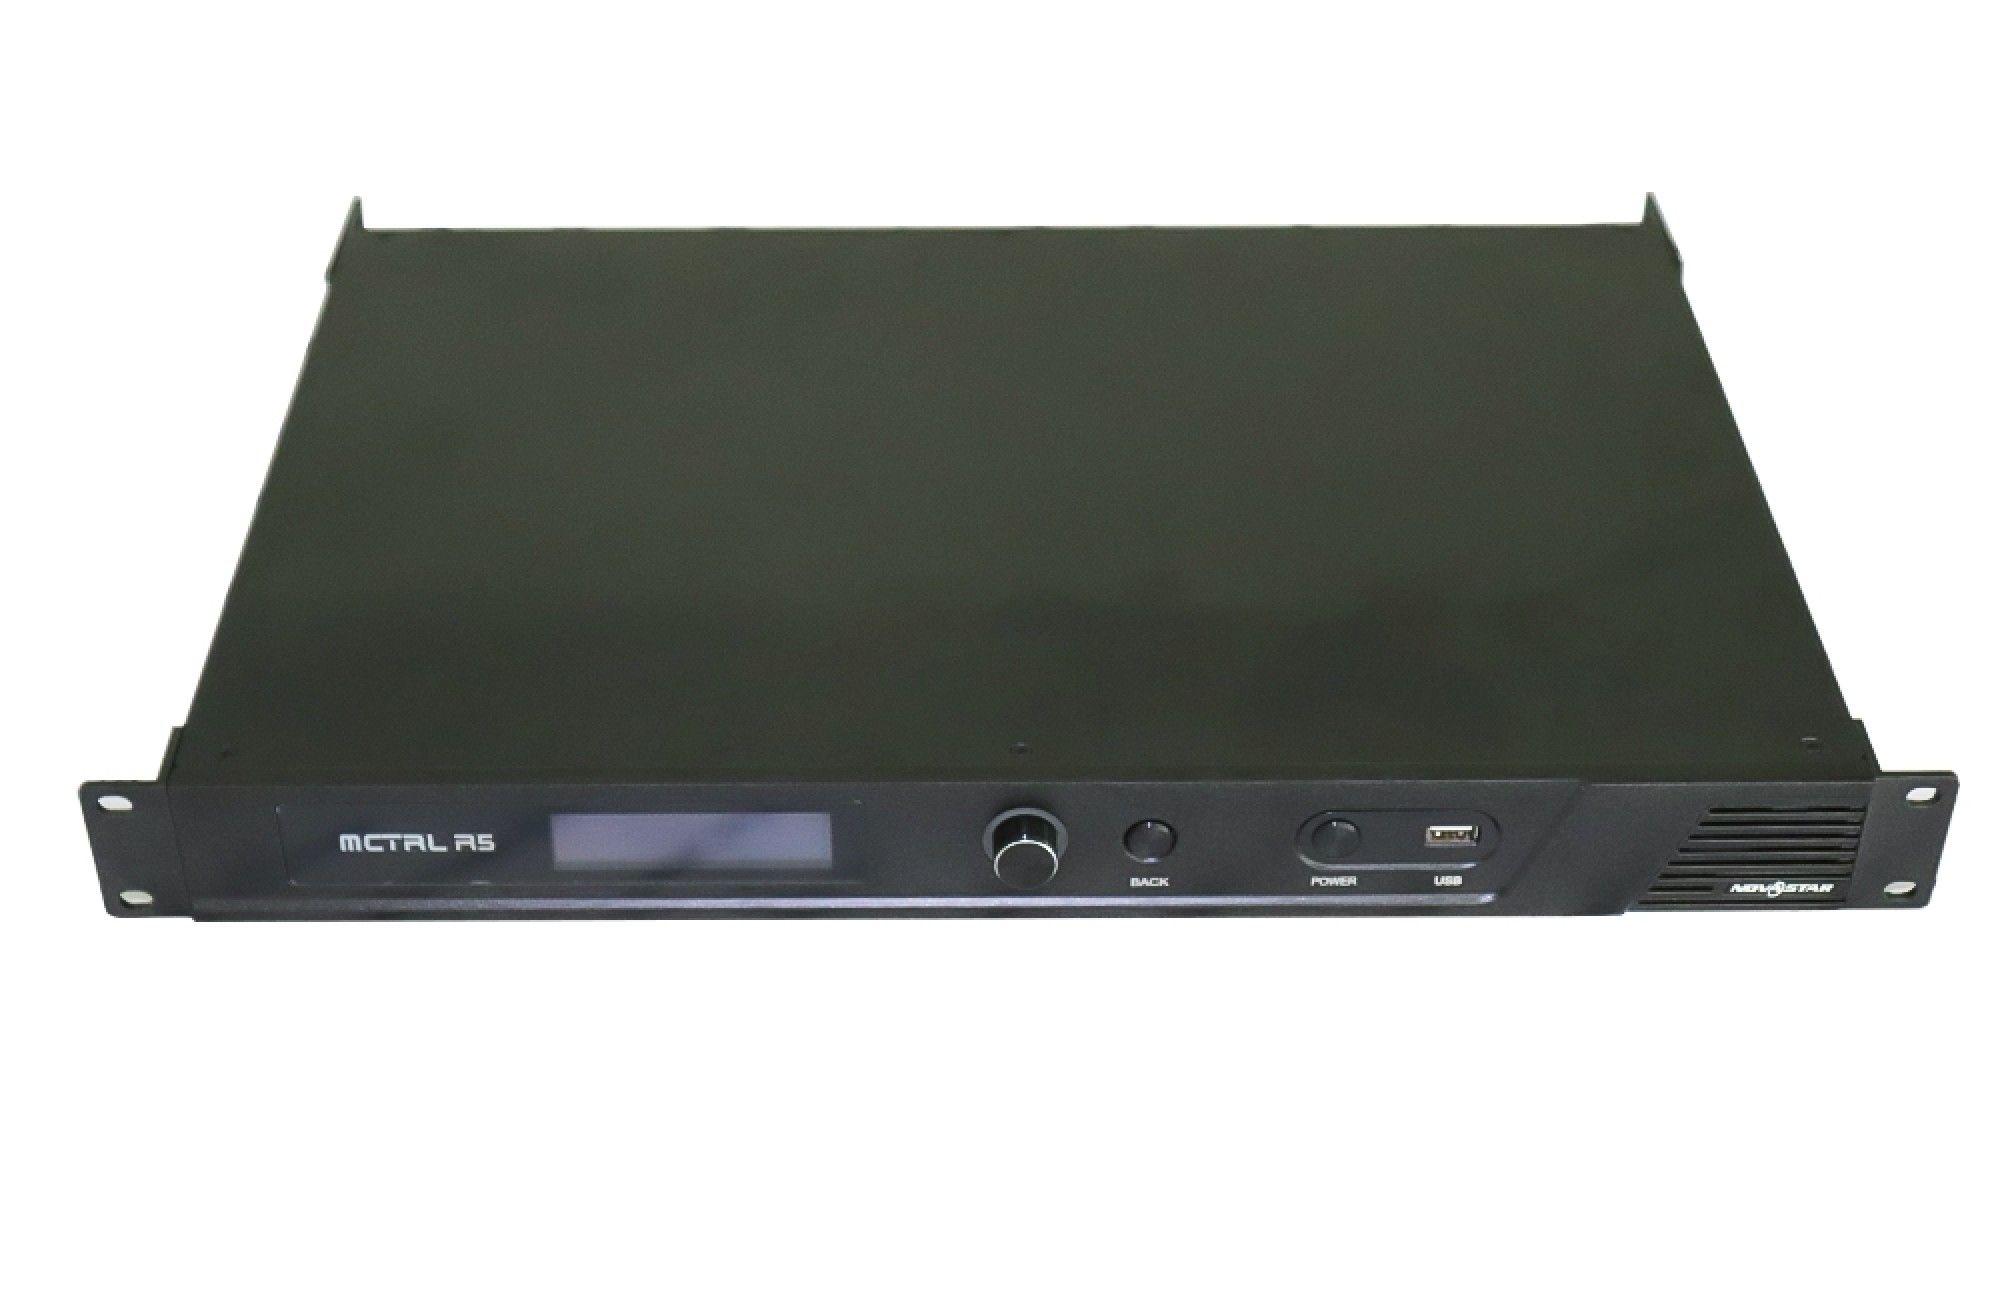 Novastar UHD MCTRLR5 Optical Fiber LED Display Controller Box